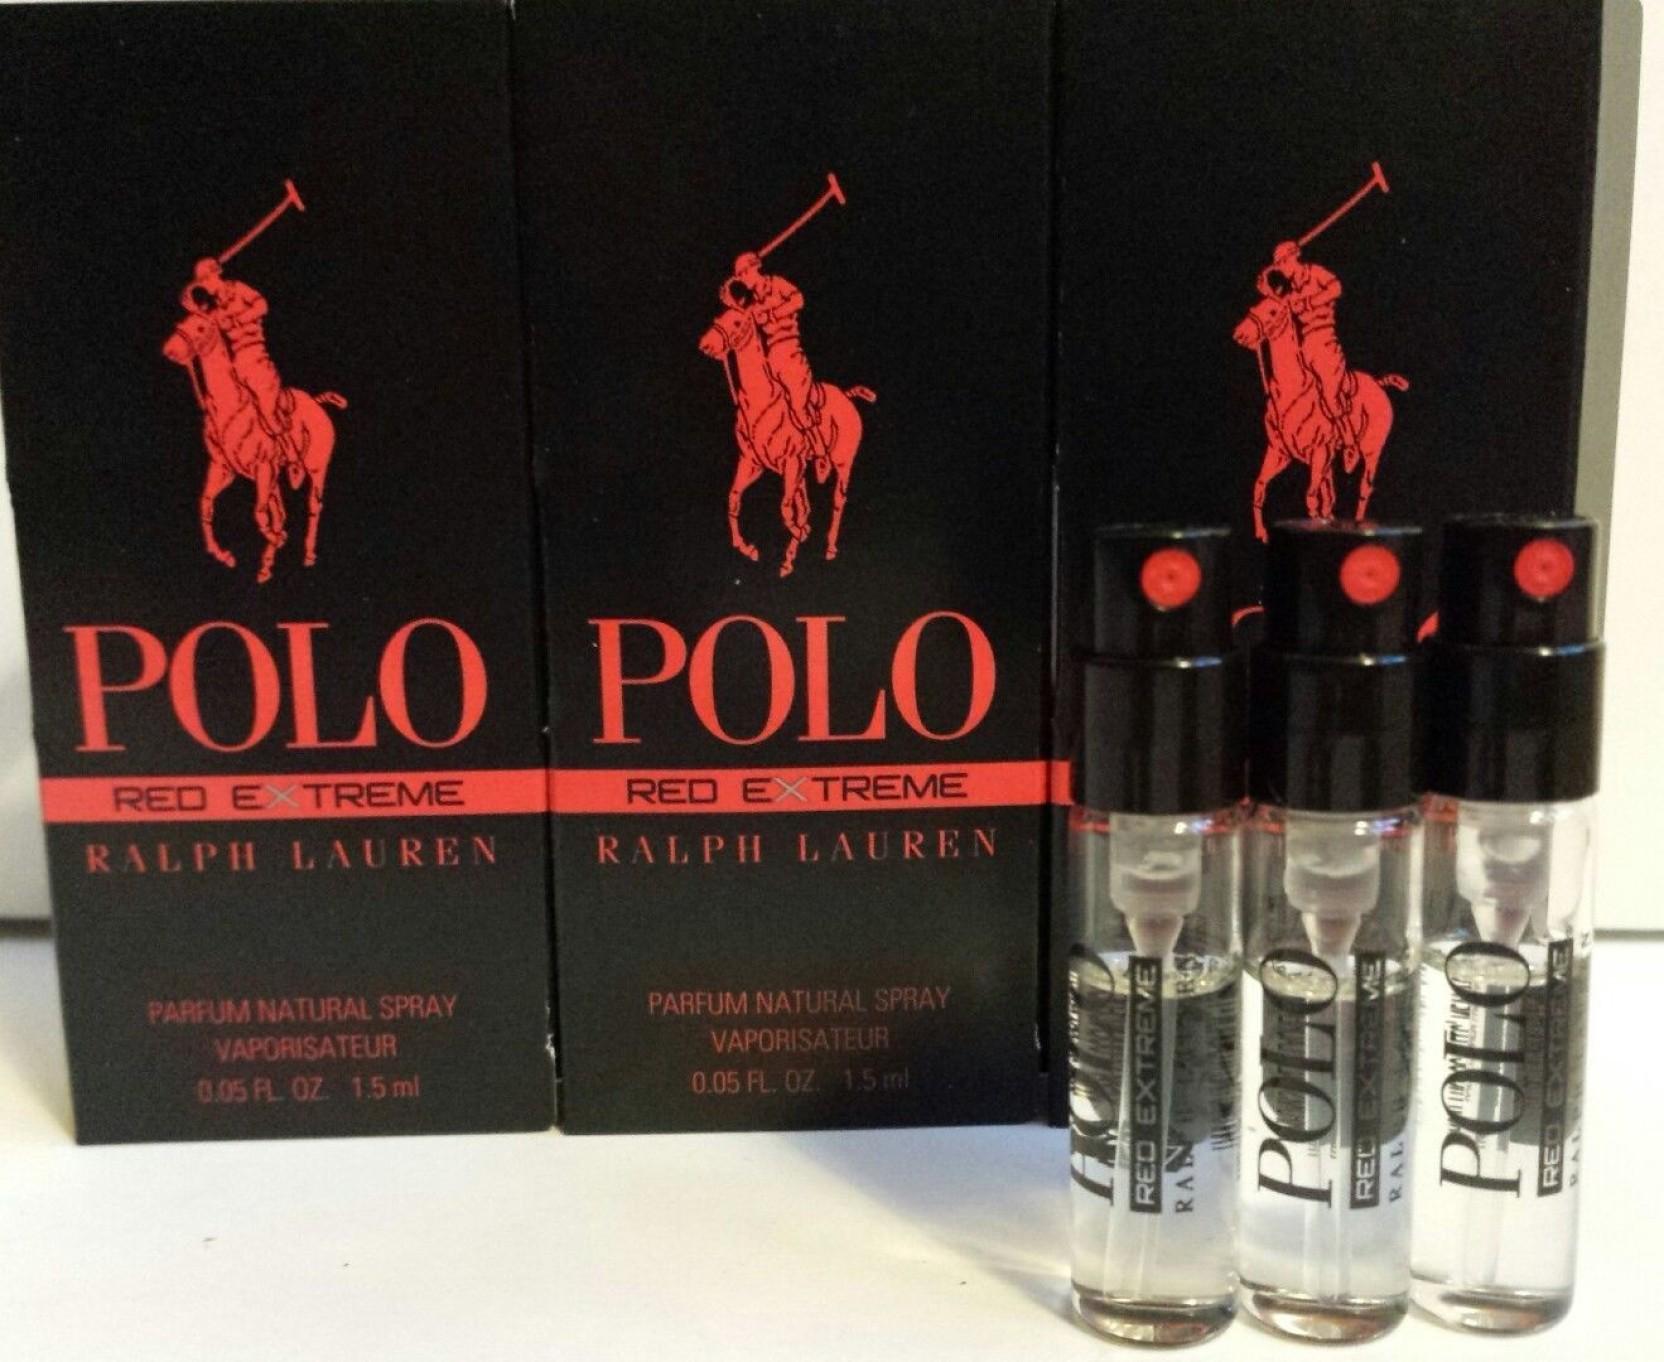 500632afd Buy Ralph Lauren Polo Red Extreme Eau de Parfum - 1.5 ml Online In ...